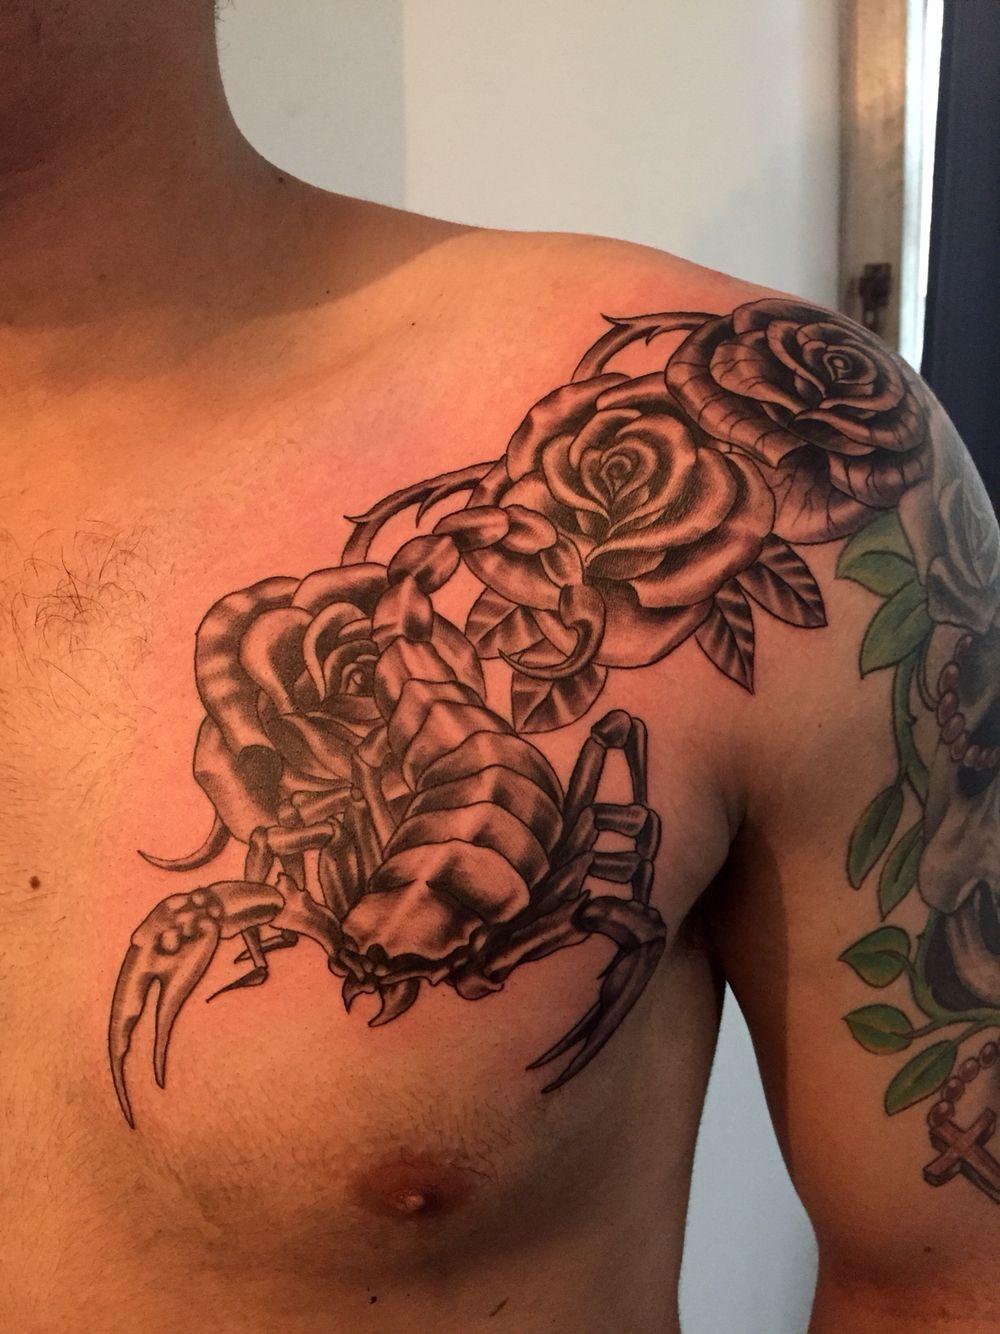 dcb6e0fa0 Rose and scorpion tattoo   Bruce tattoo   Tattoos for guys, Tattoos ...